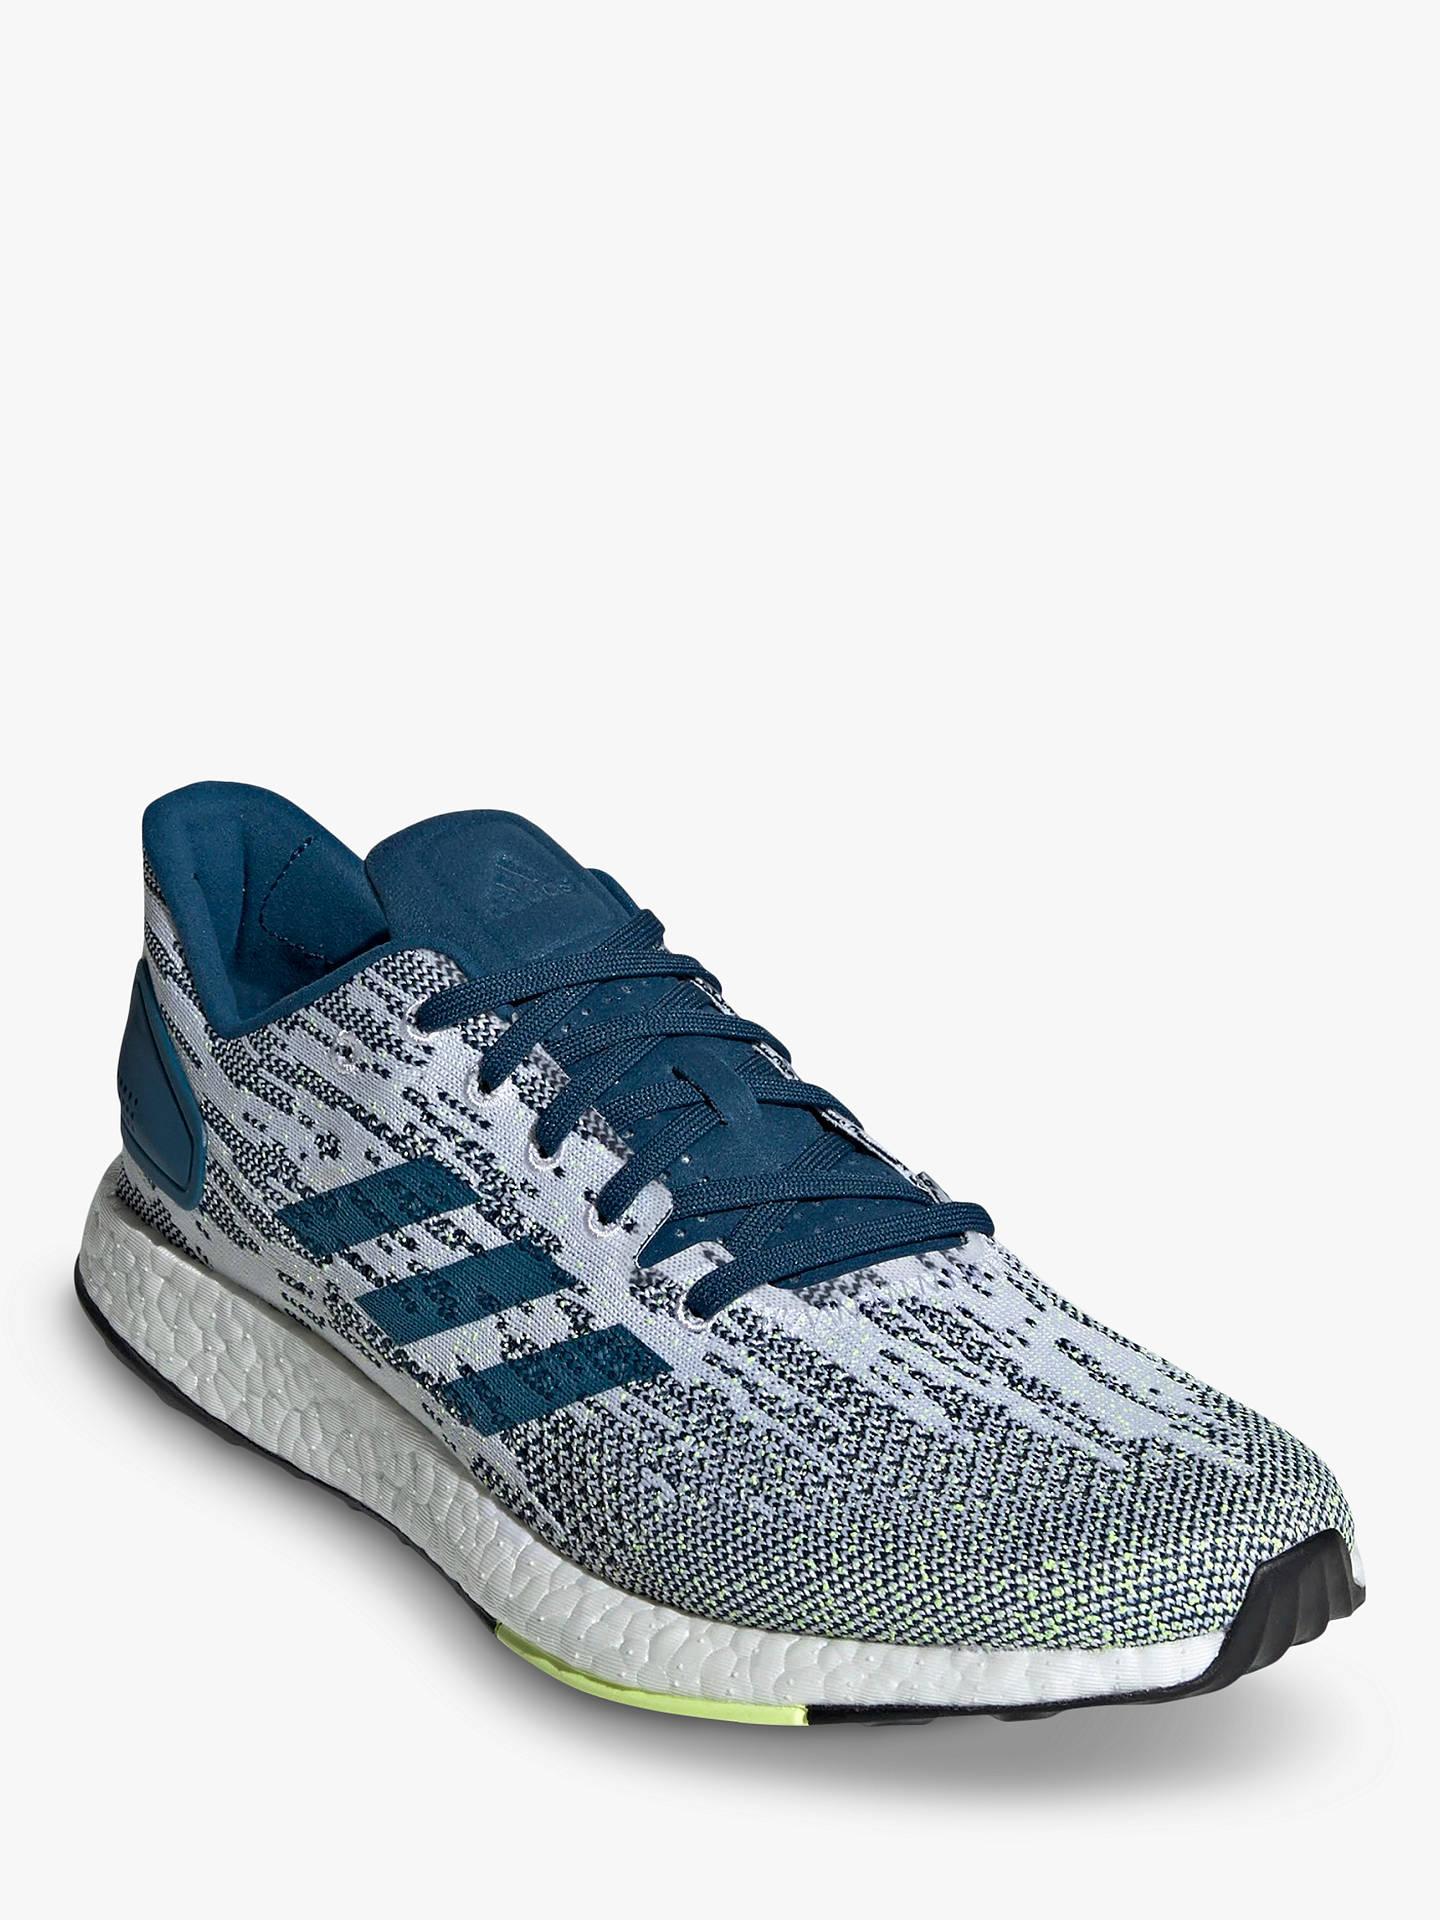 f3734ef45 ... Buy adidas PureBoost DPR Men s Running Shoes